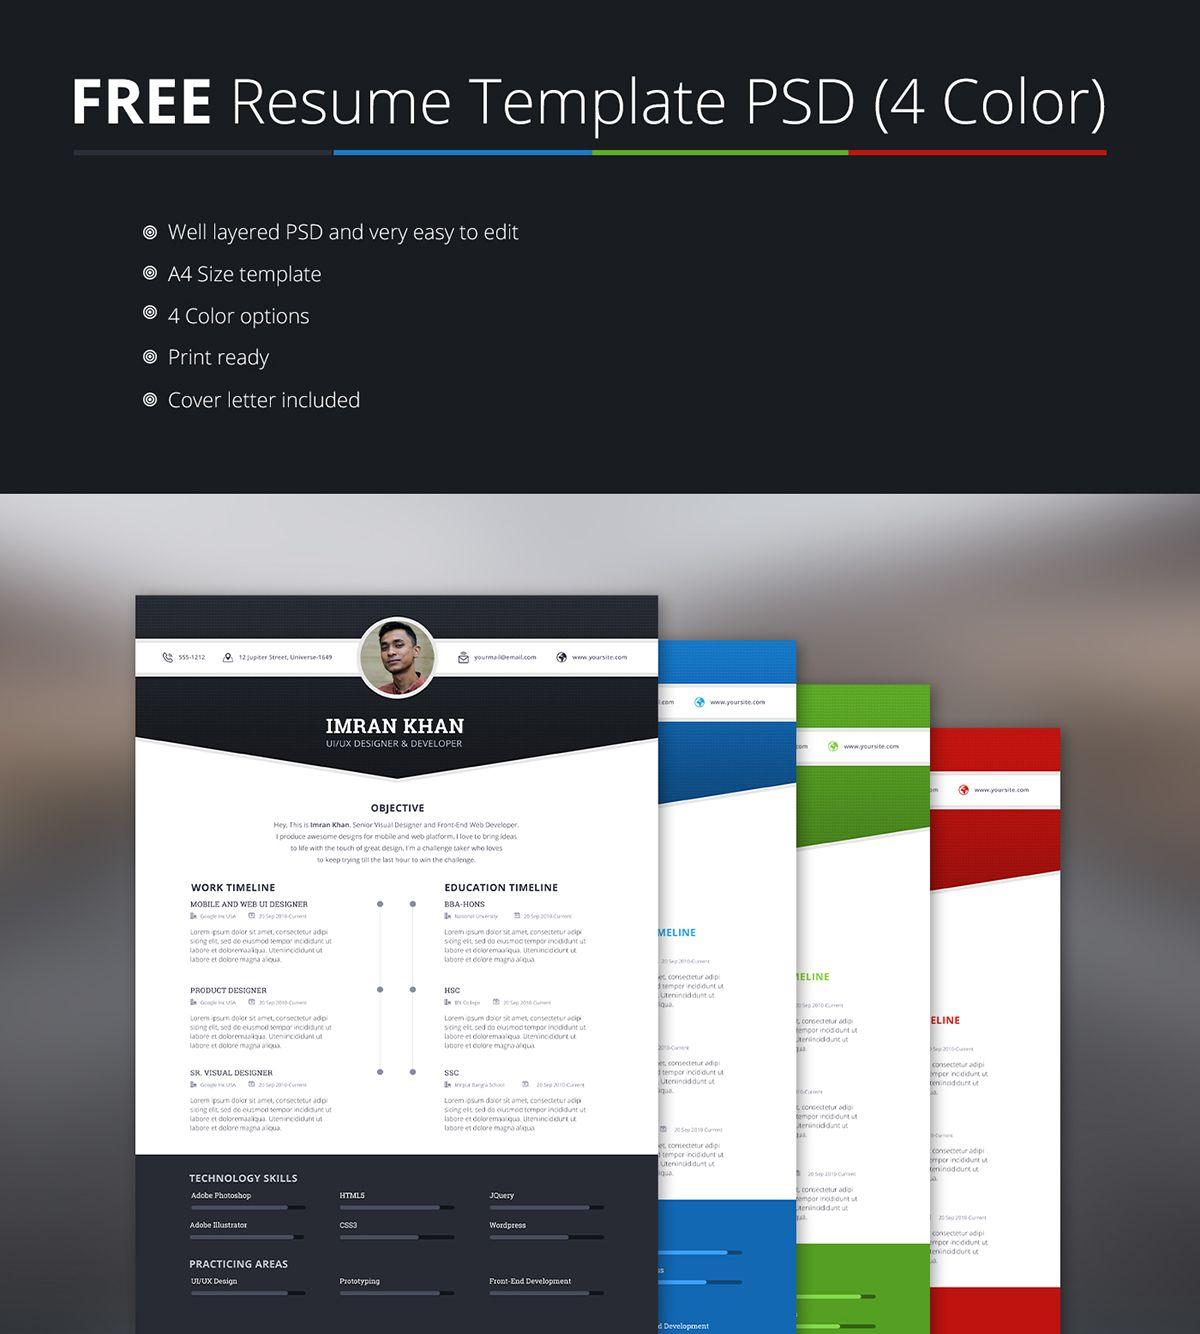 free resume template psd 4 colors resume pinterest resume